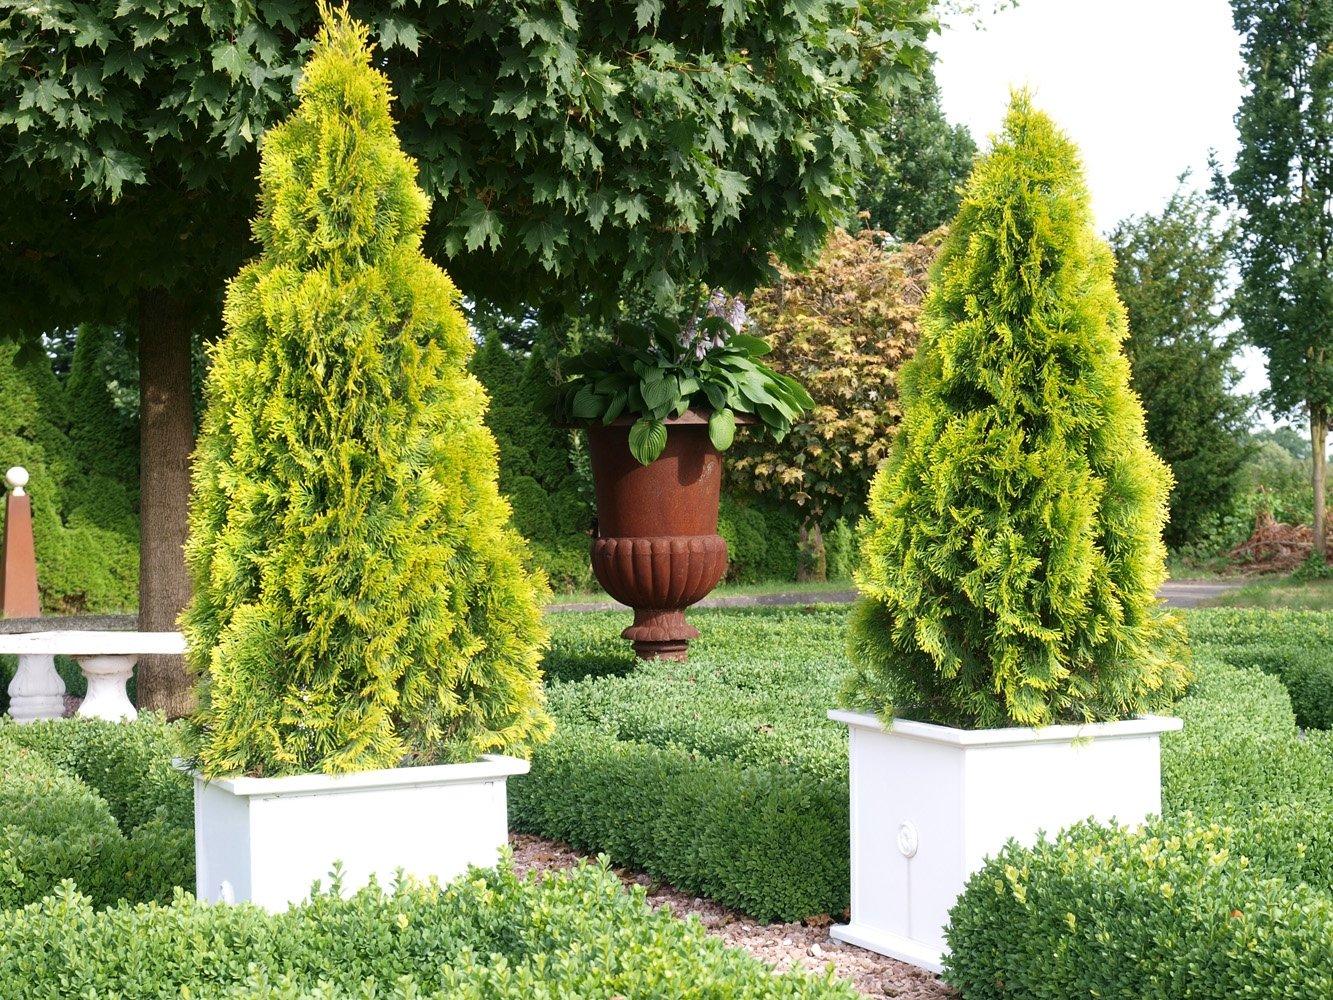 Thuja Smaragd Occidentalis Lebensbaum winterhart & pflegeleicht